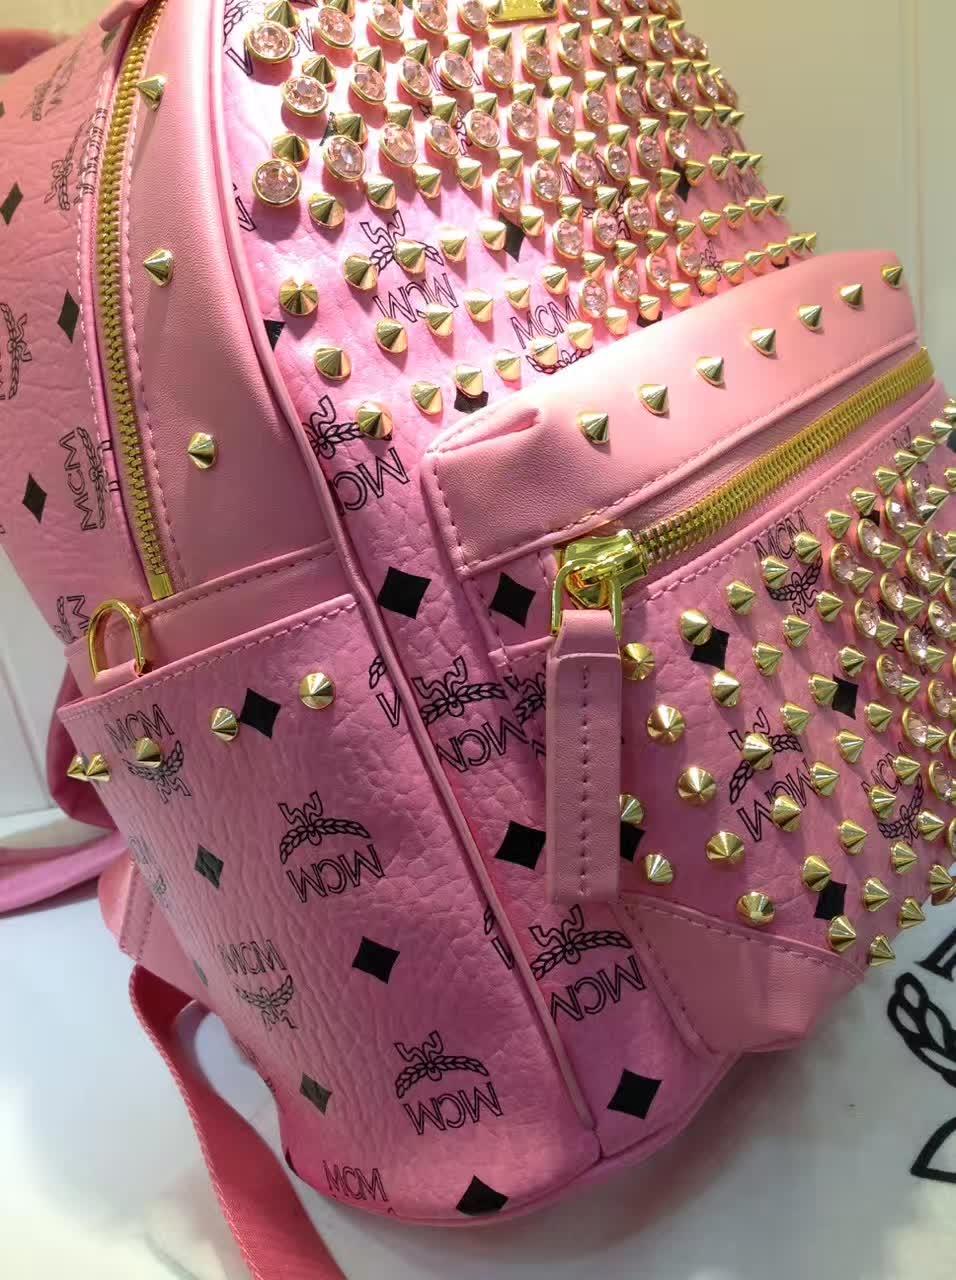 MCM包包批发 BIONIC系列背包 全新金属牌 耐用绒布内里 ykk拉链头配U型扣 粉色